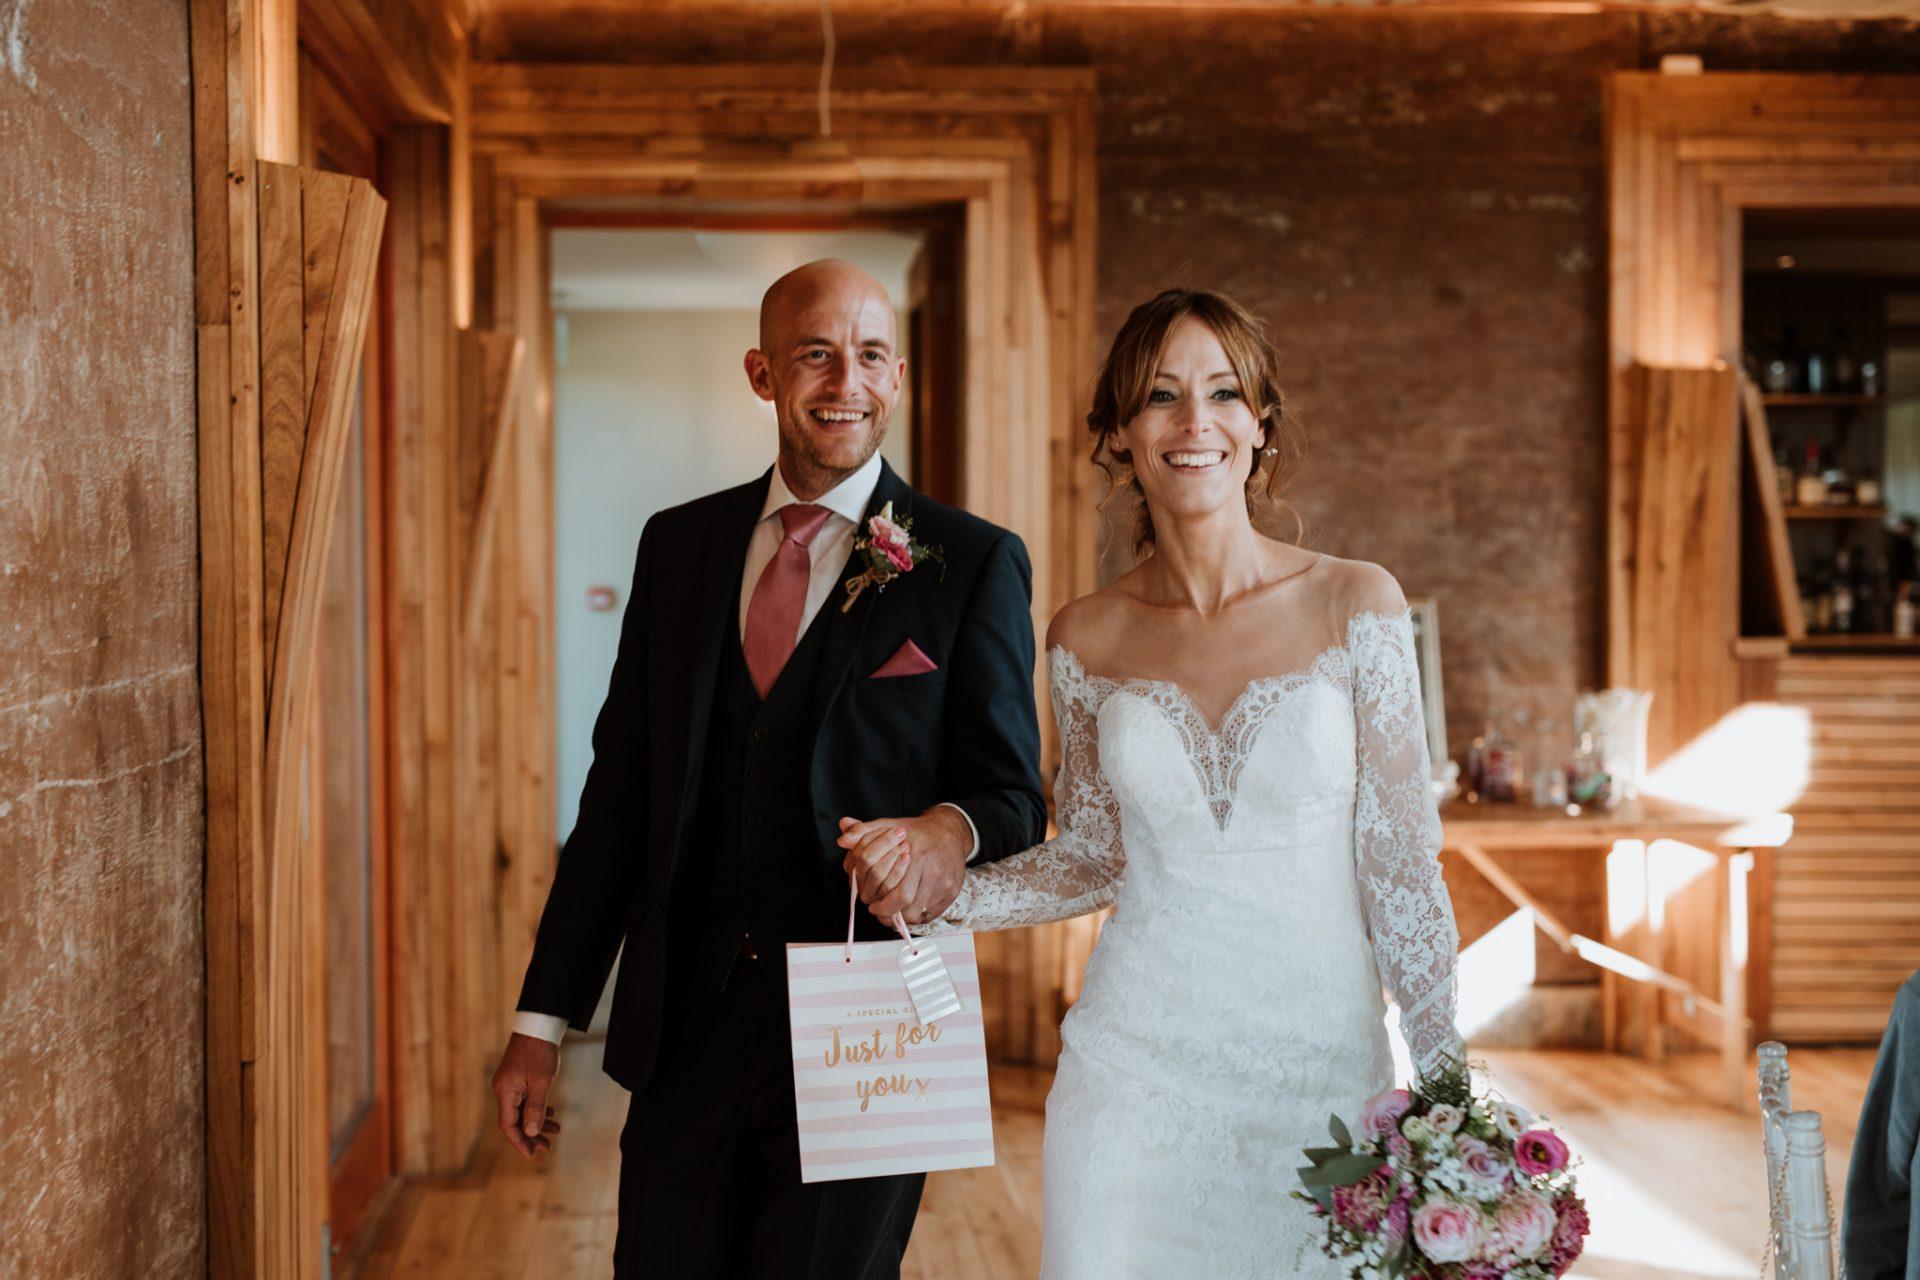 couple walk in to wedding breakfast room